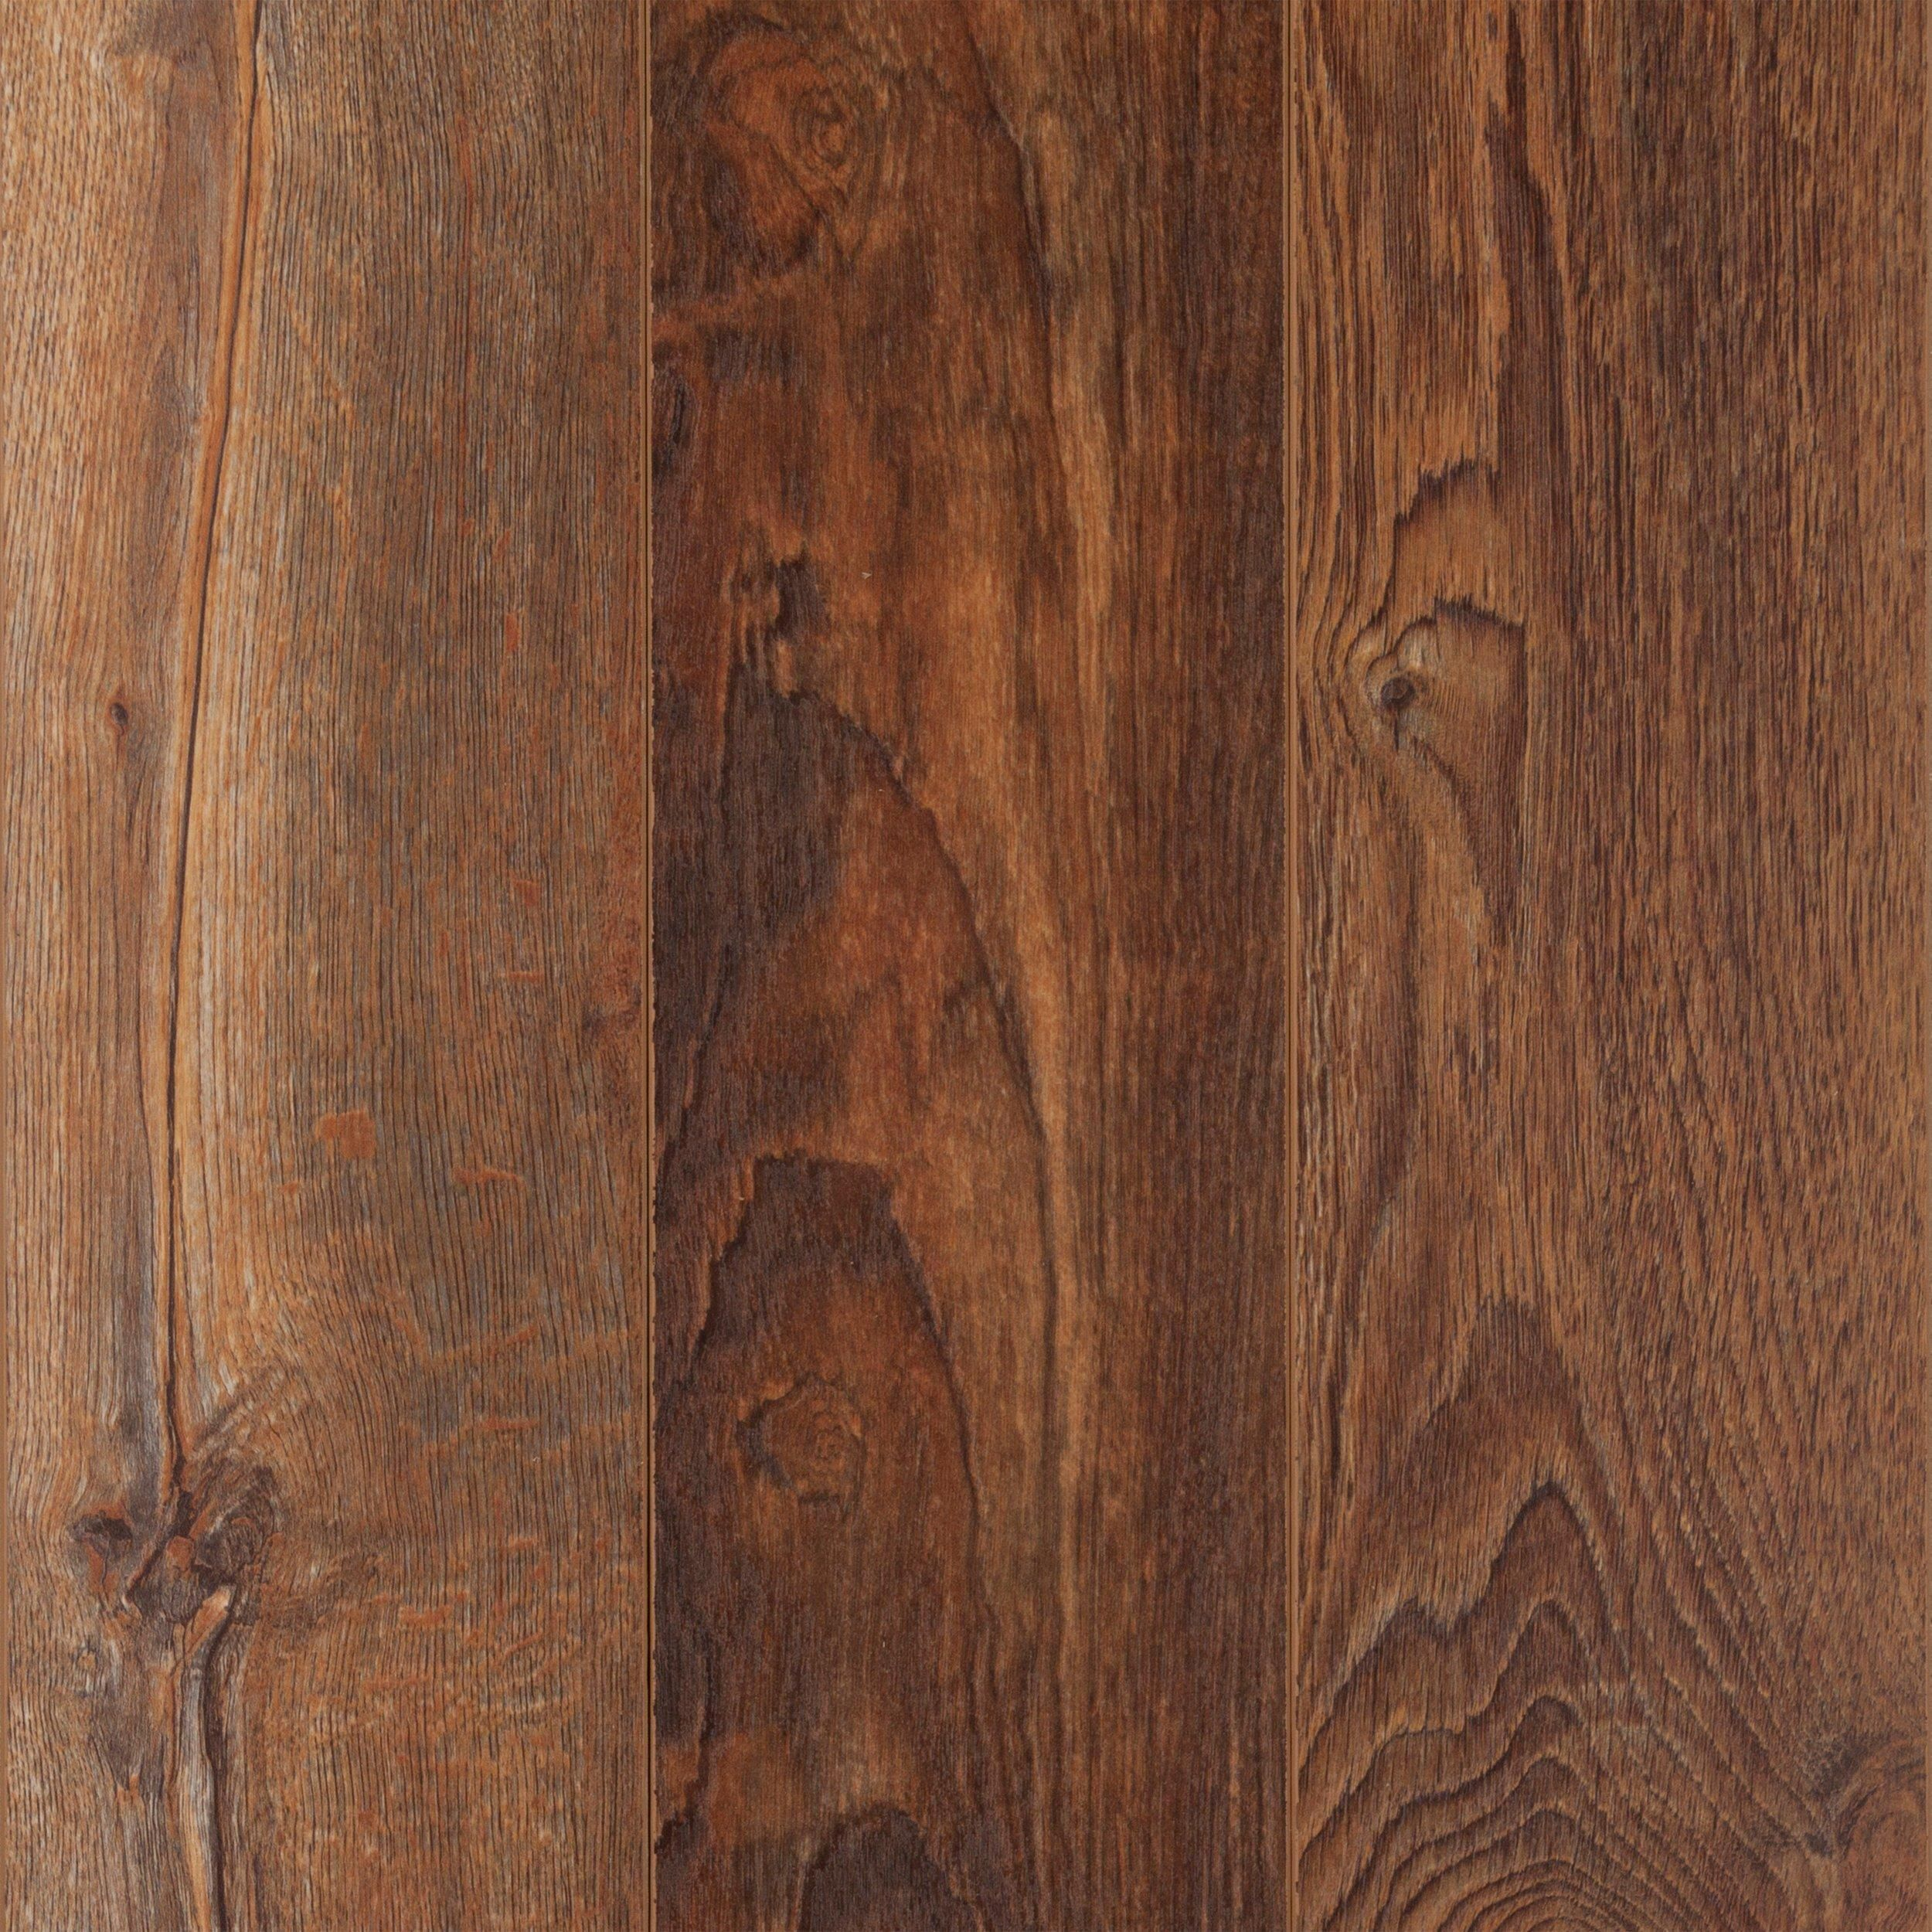 Old Original Random Width Laminate Flooring Laminate Flooring Laminate Flooring Prices